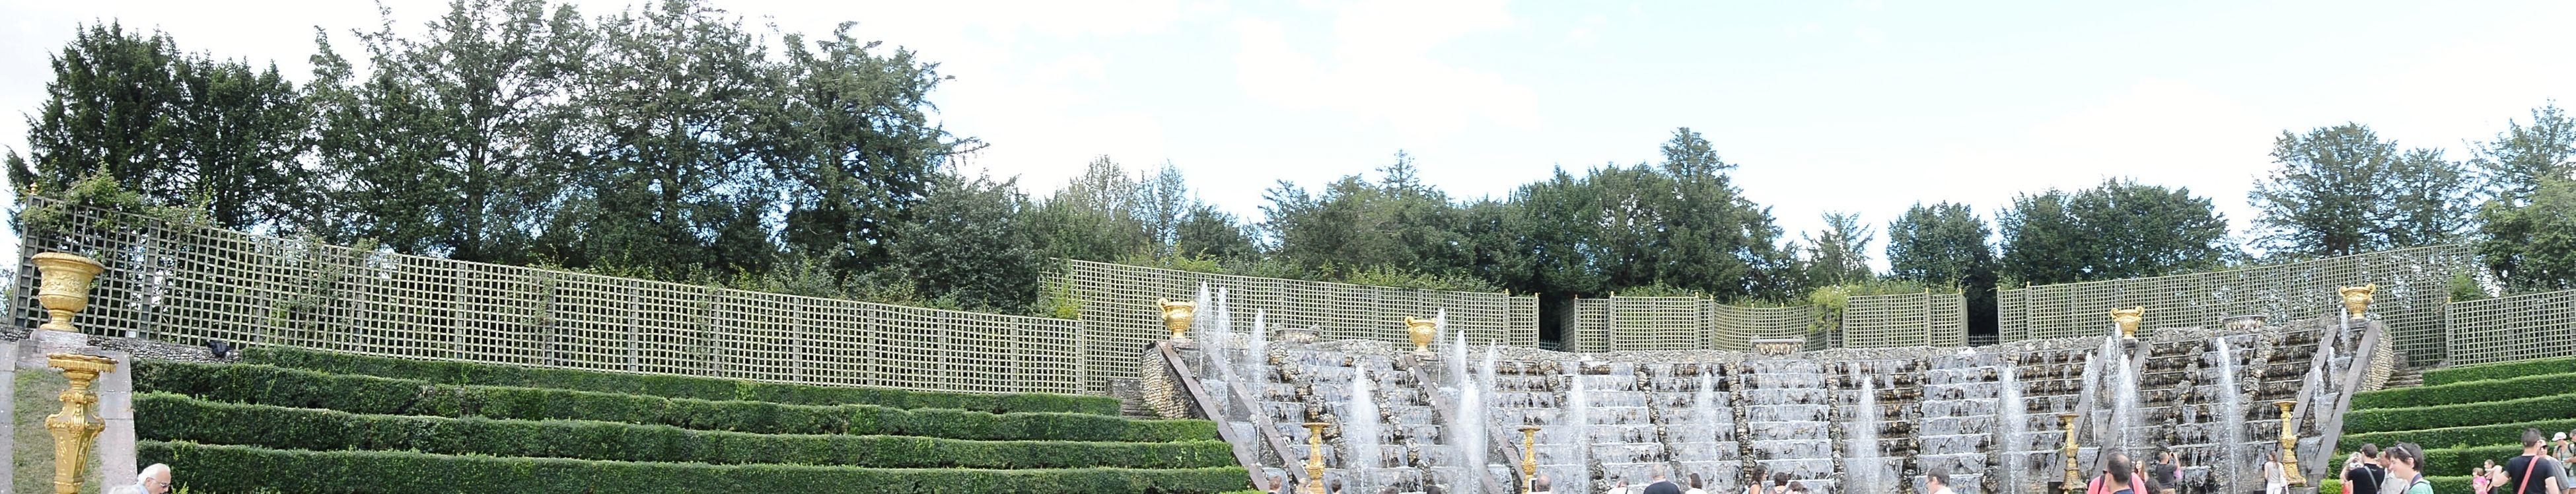 Versailles Versailles Gardens Bosquet De La Salle De Bal Panoramic View Throw A Curve